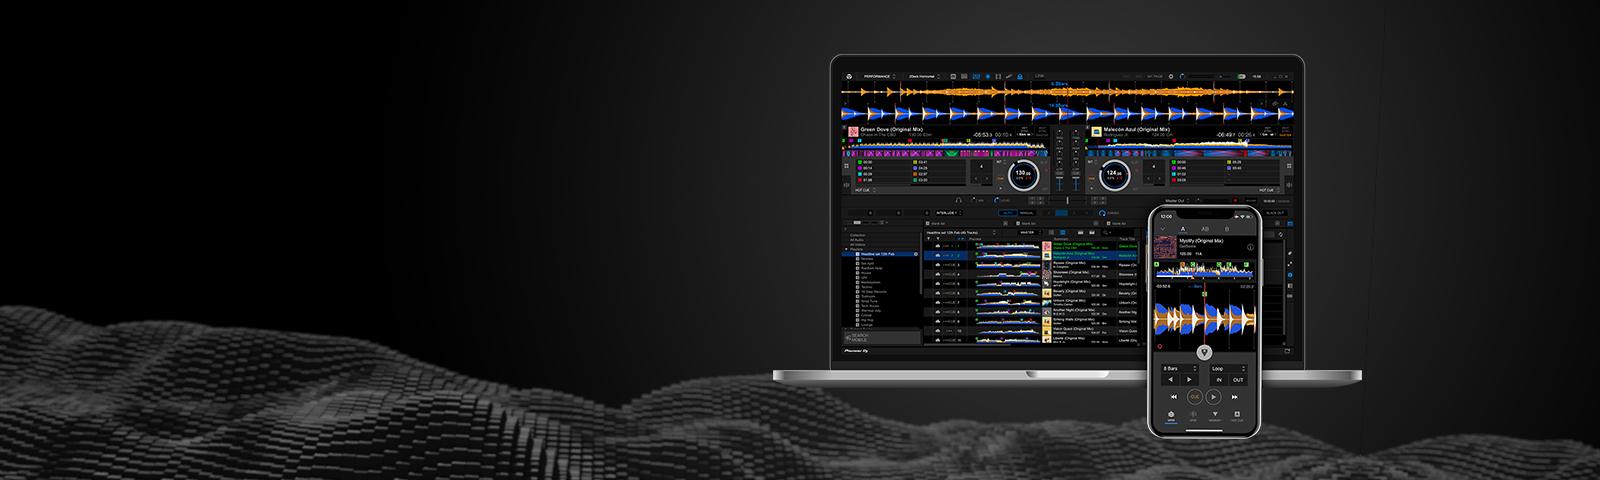 rekordbox-6-product-page-header-1600x480